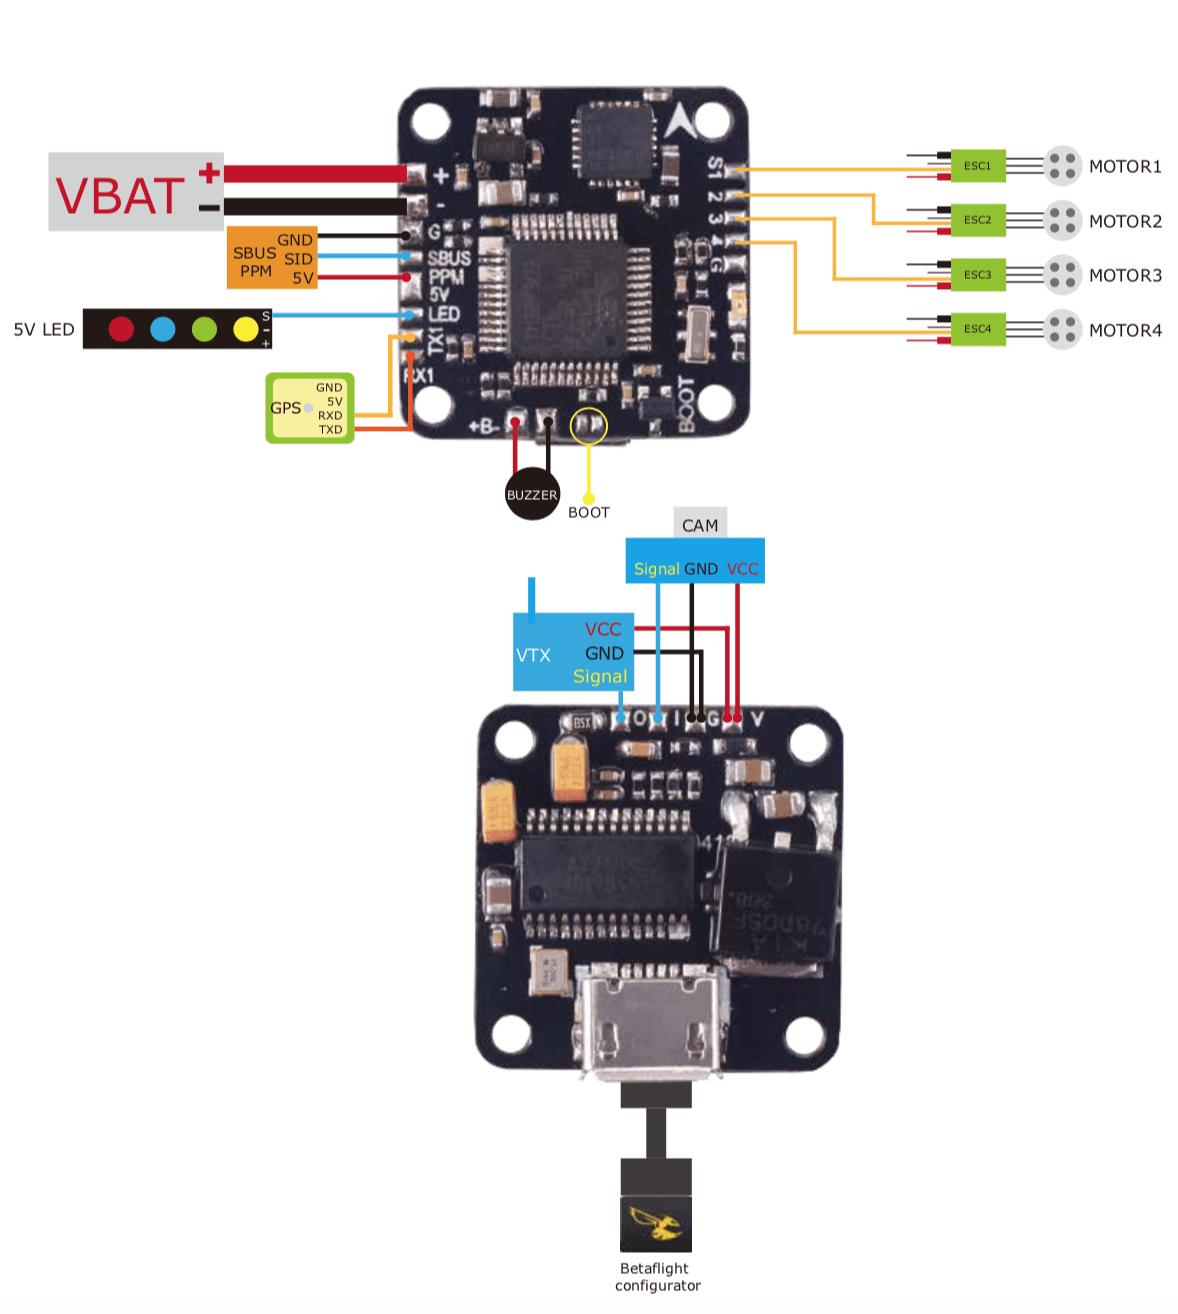 fpv racing drone wiring diagram baldor motor l1410t tiny f3 flight controller with osd – betaflight dshot (16x16mm mount) flex rc